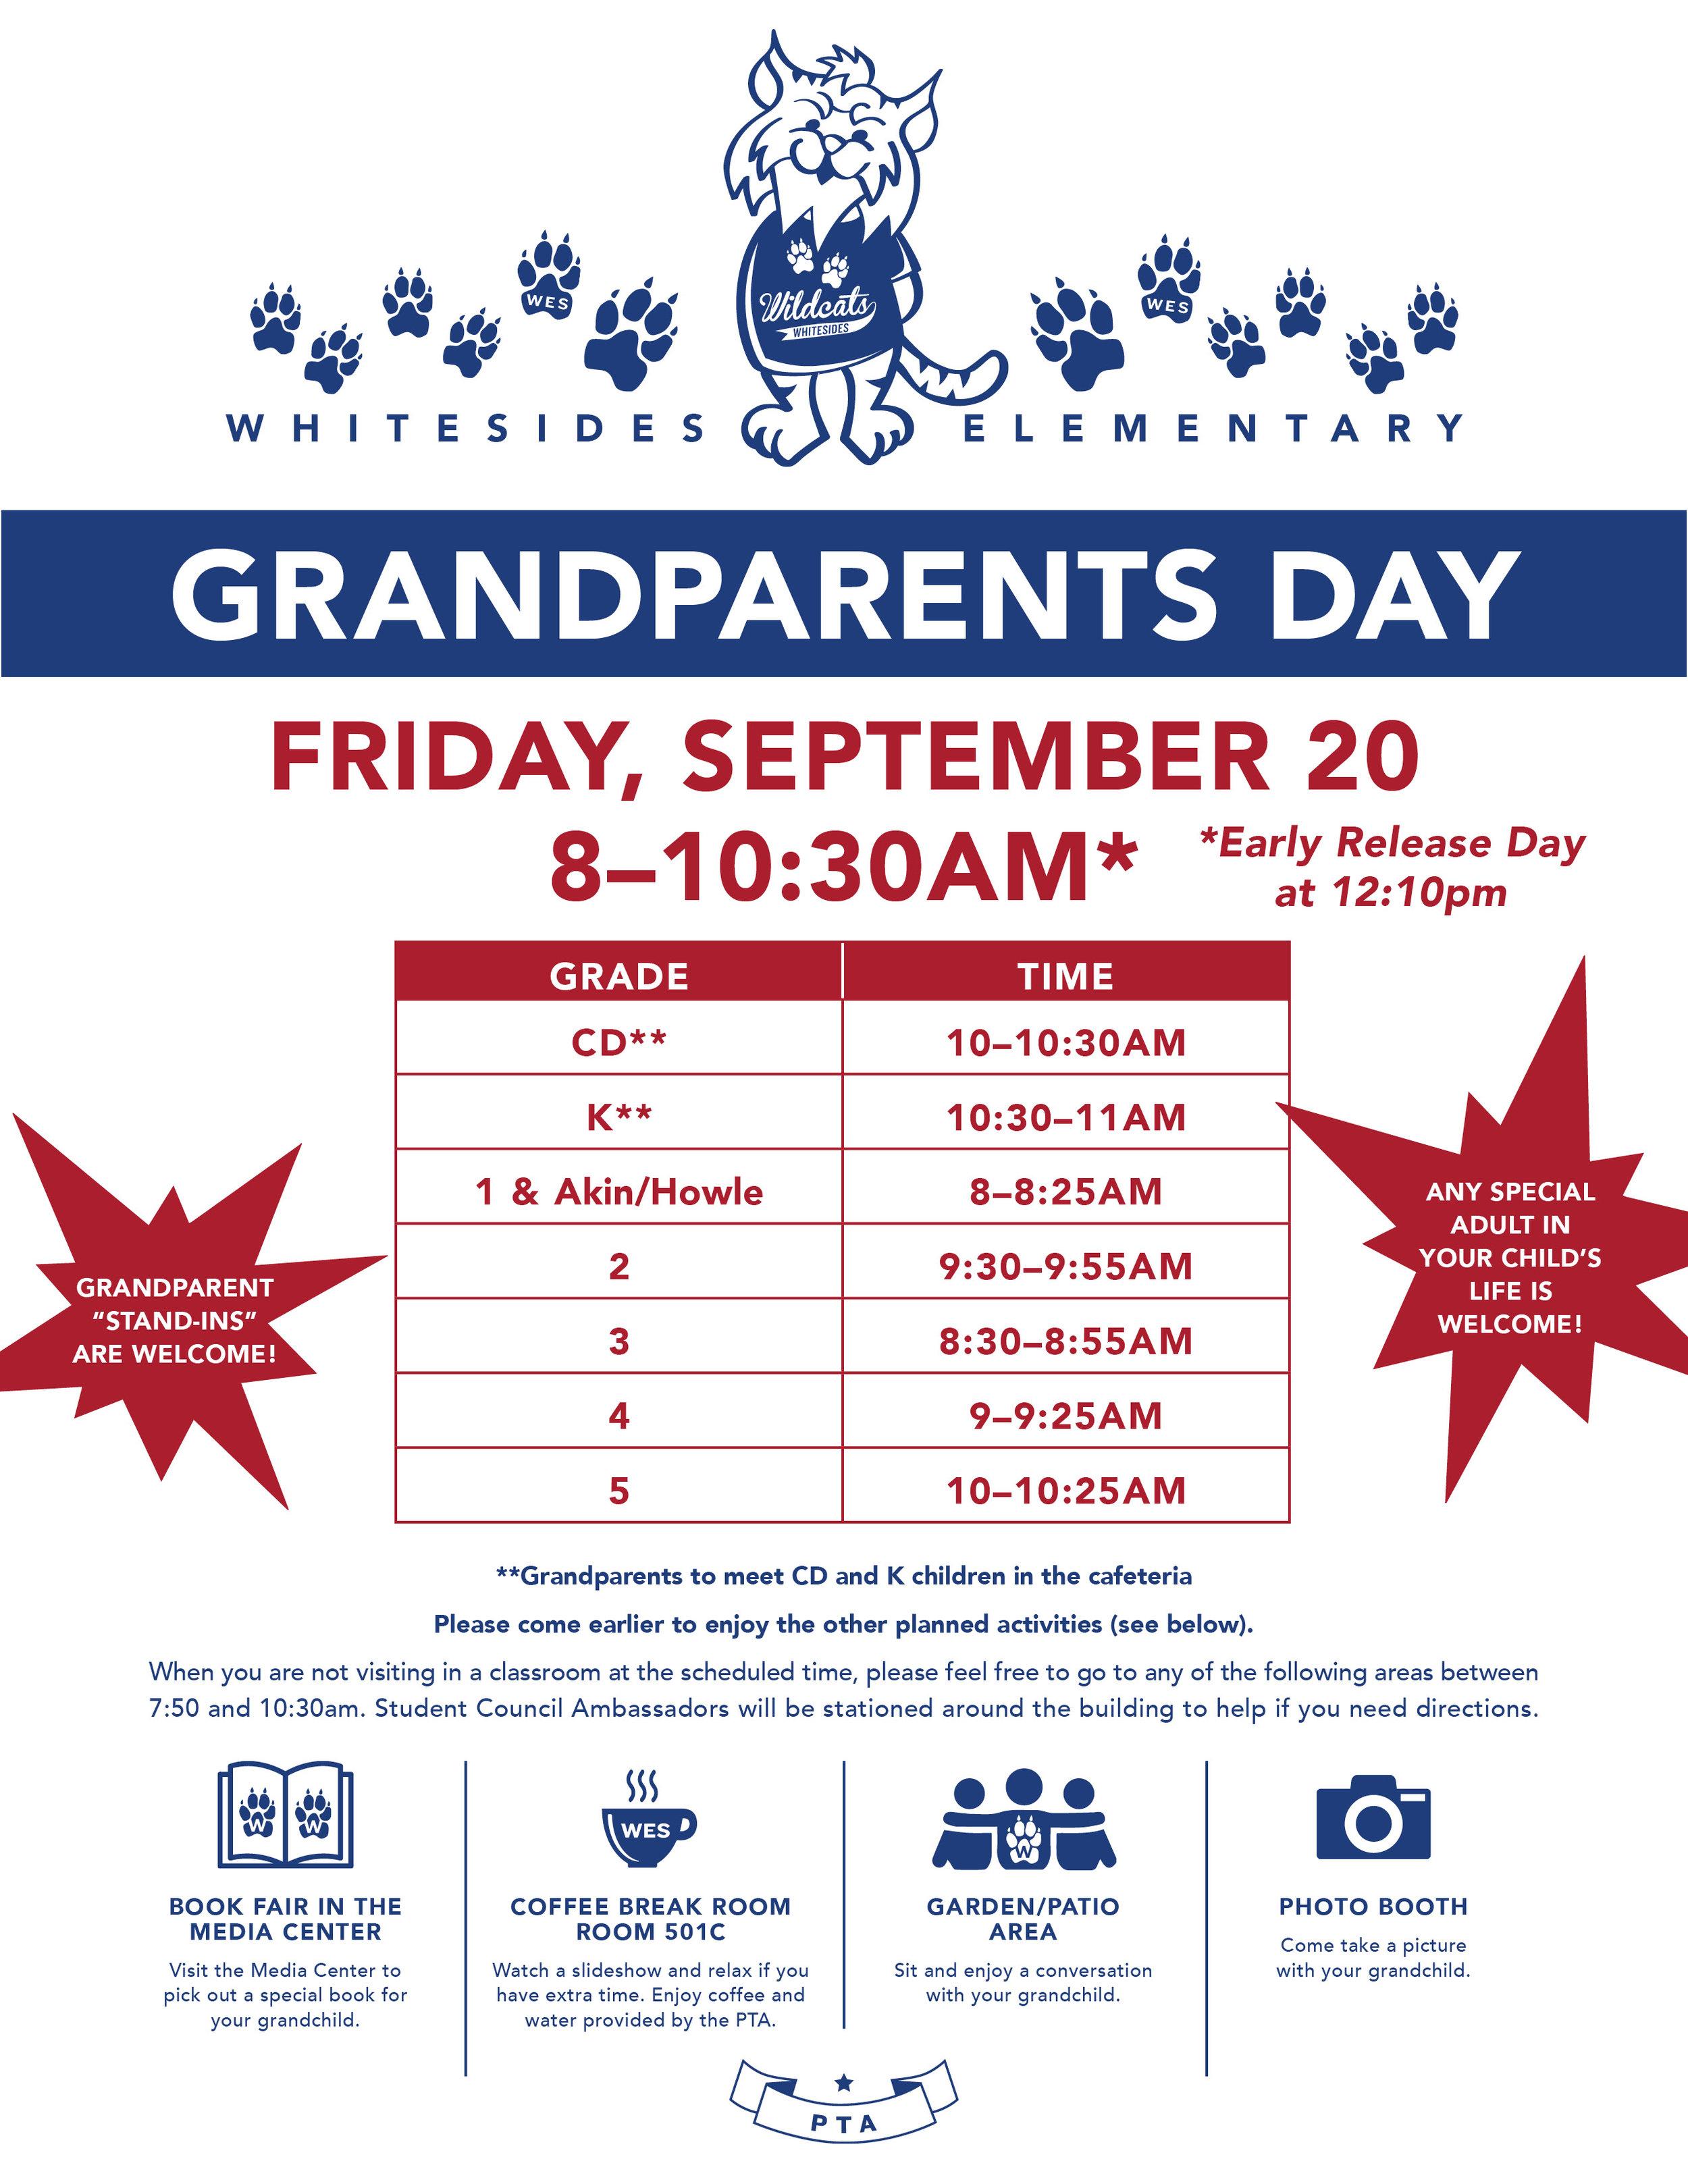 GrandparentsDay-Flyer2019_v4.jpg